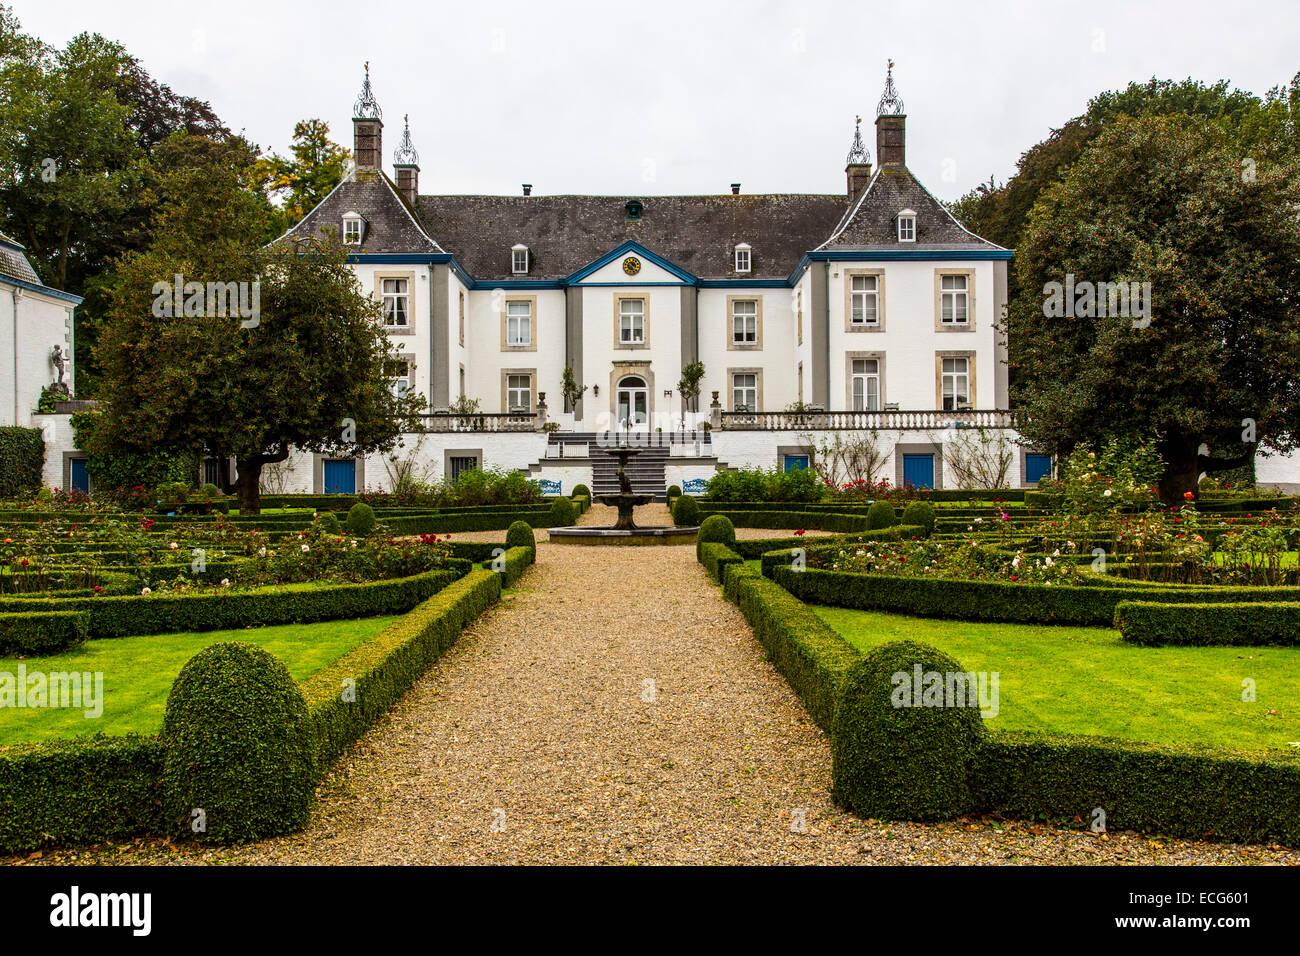 Weingut, Schloss Genoels Edleren, das größte Weingut in Belgien Stockbild